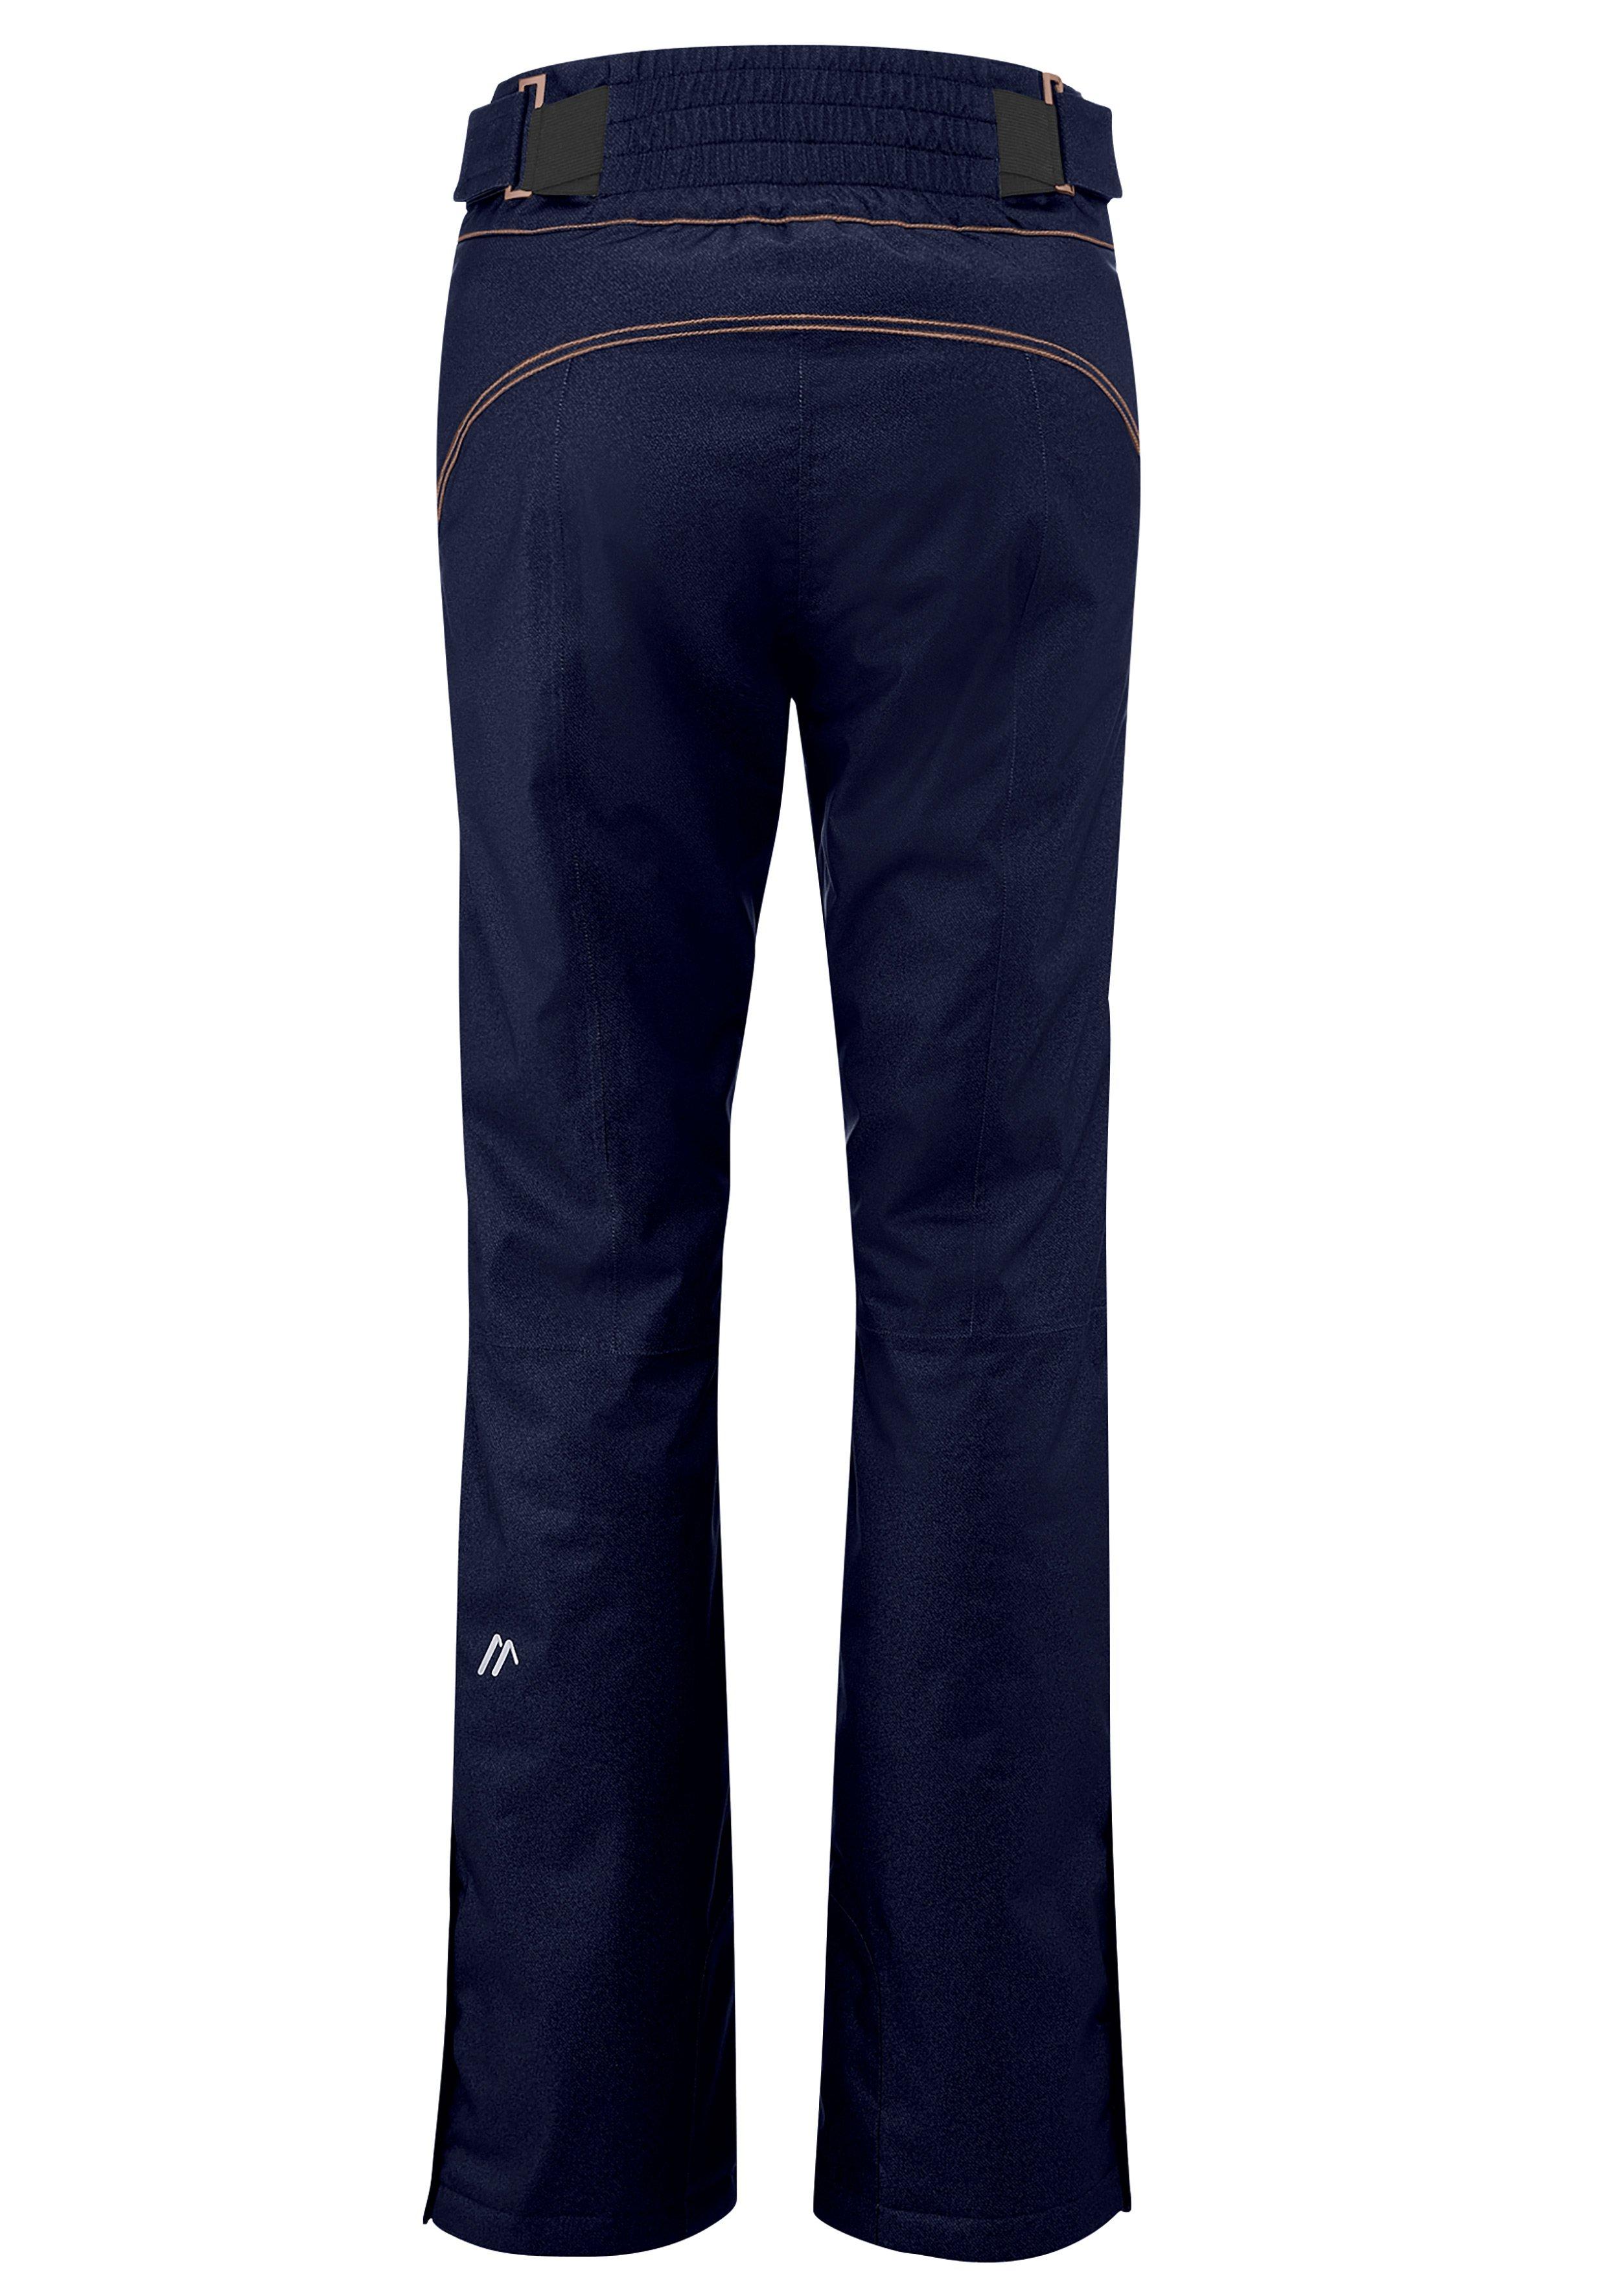 Maier Sports Skihose Denimtogo W | Sportbekleidung > Sporthosen > Sonstige Sporthosen | maier sports